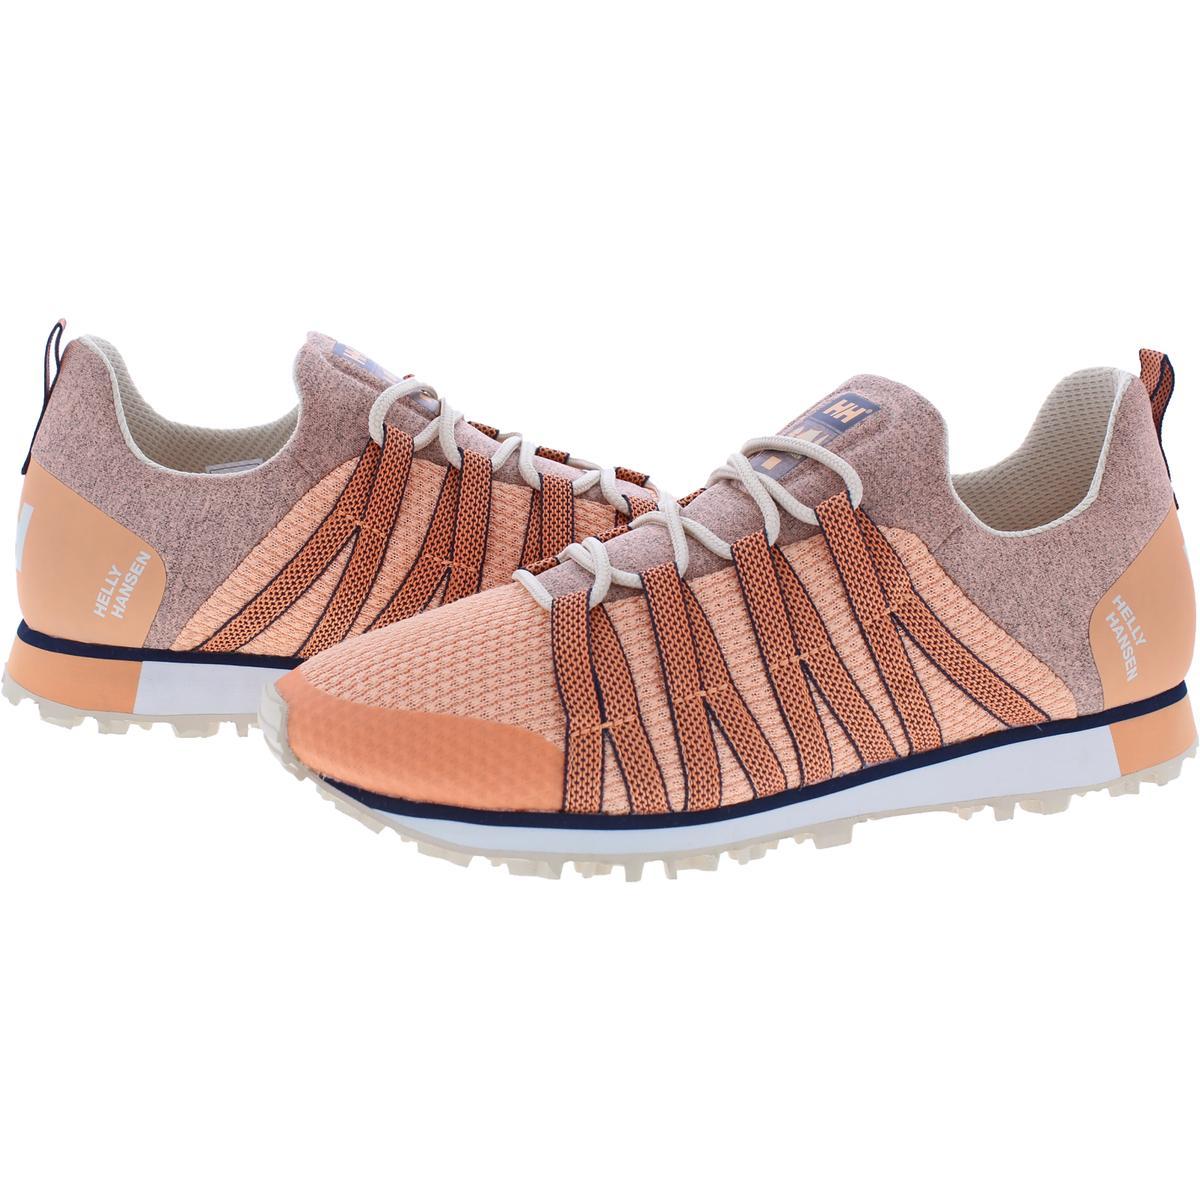 thumbnail 12 - Helly Hansen Womens Vardapeak V2 Fitness Performance Sneakers Shoes BHFO 9846